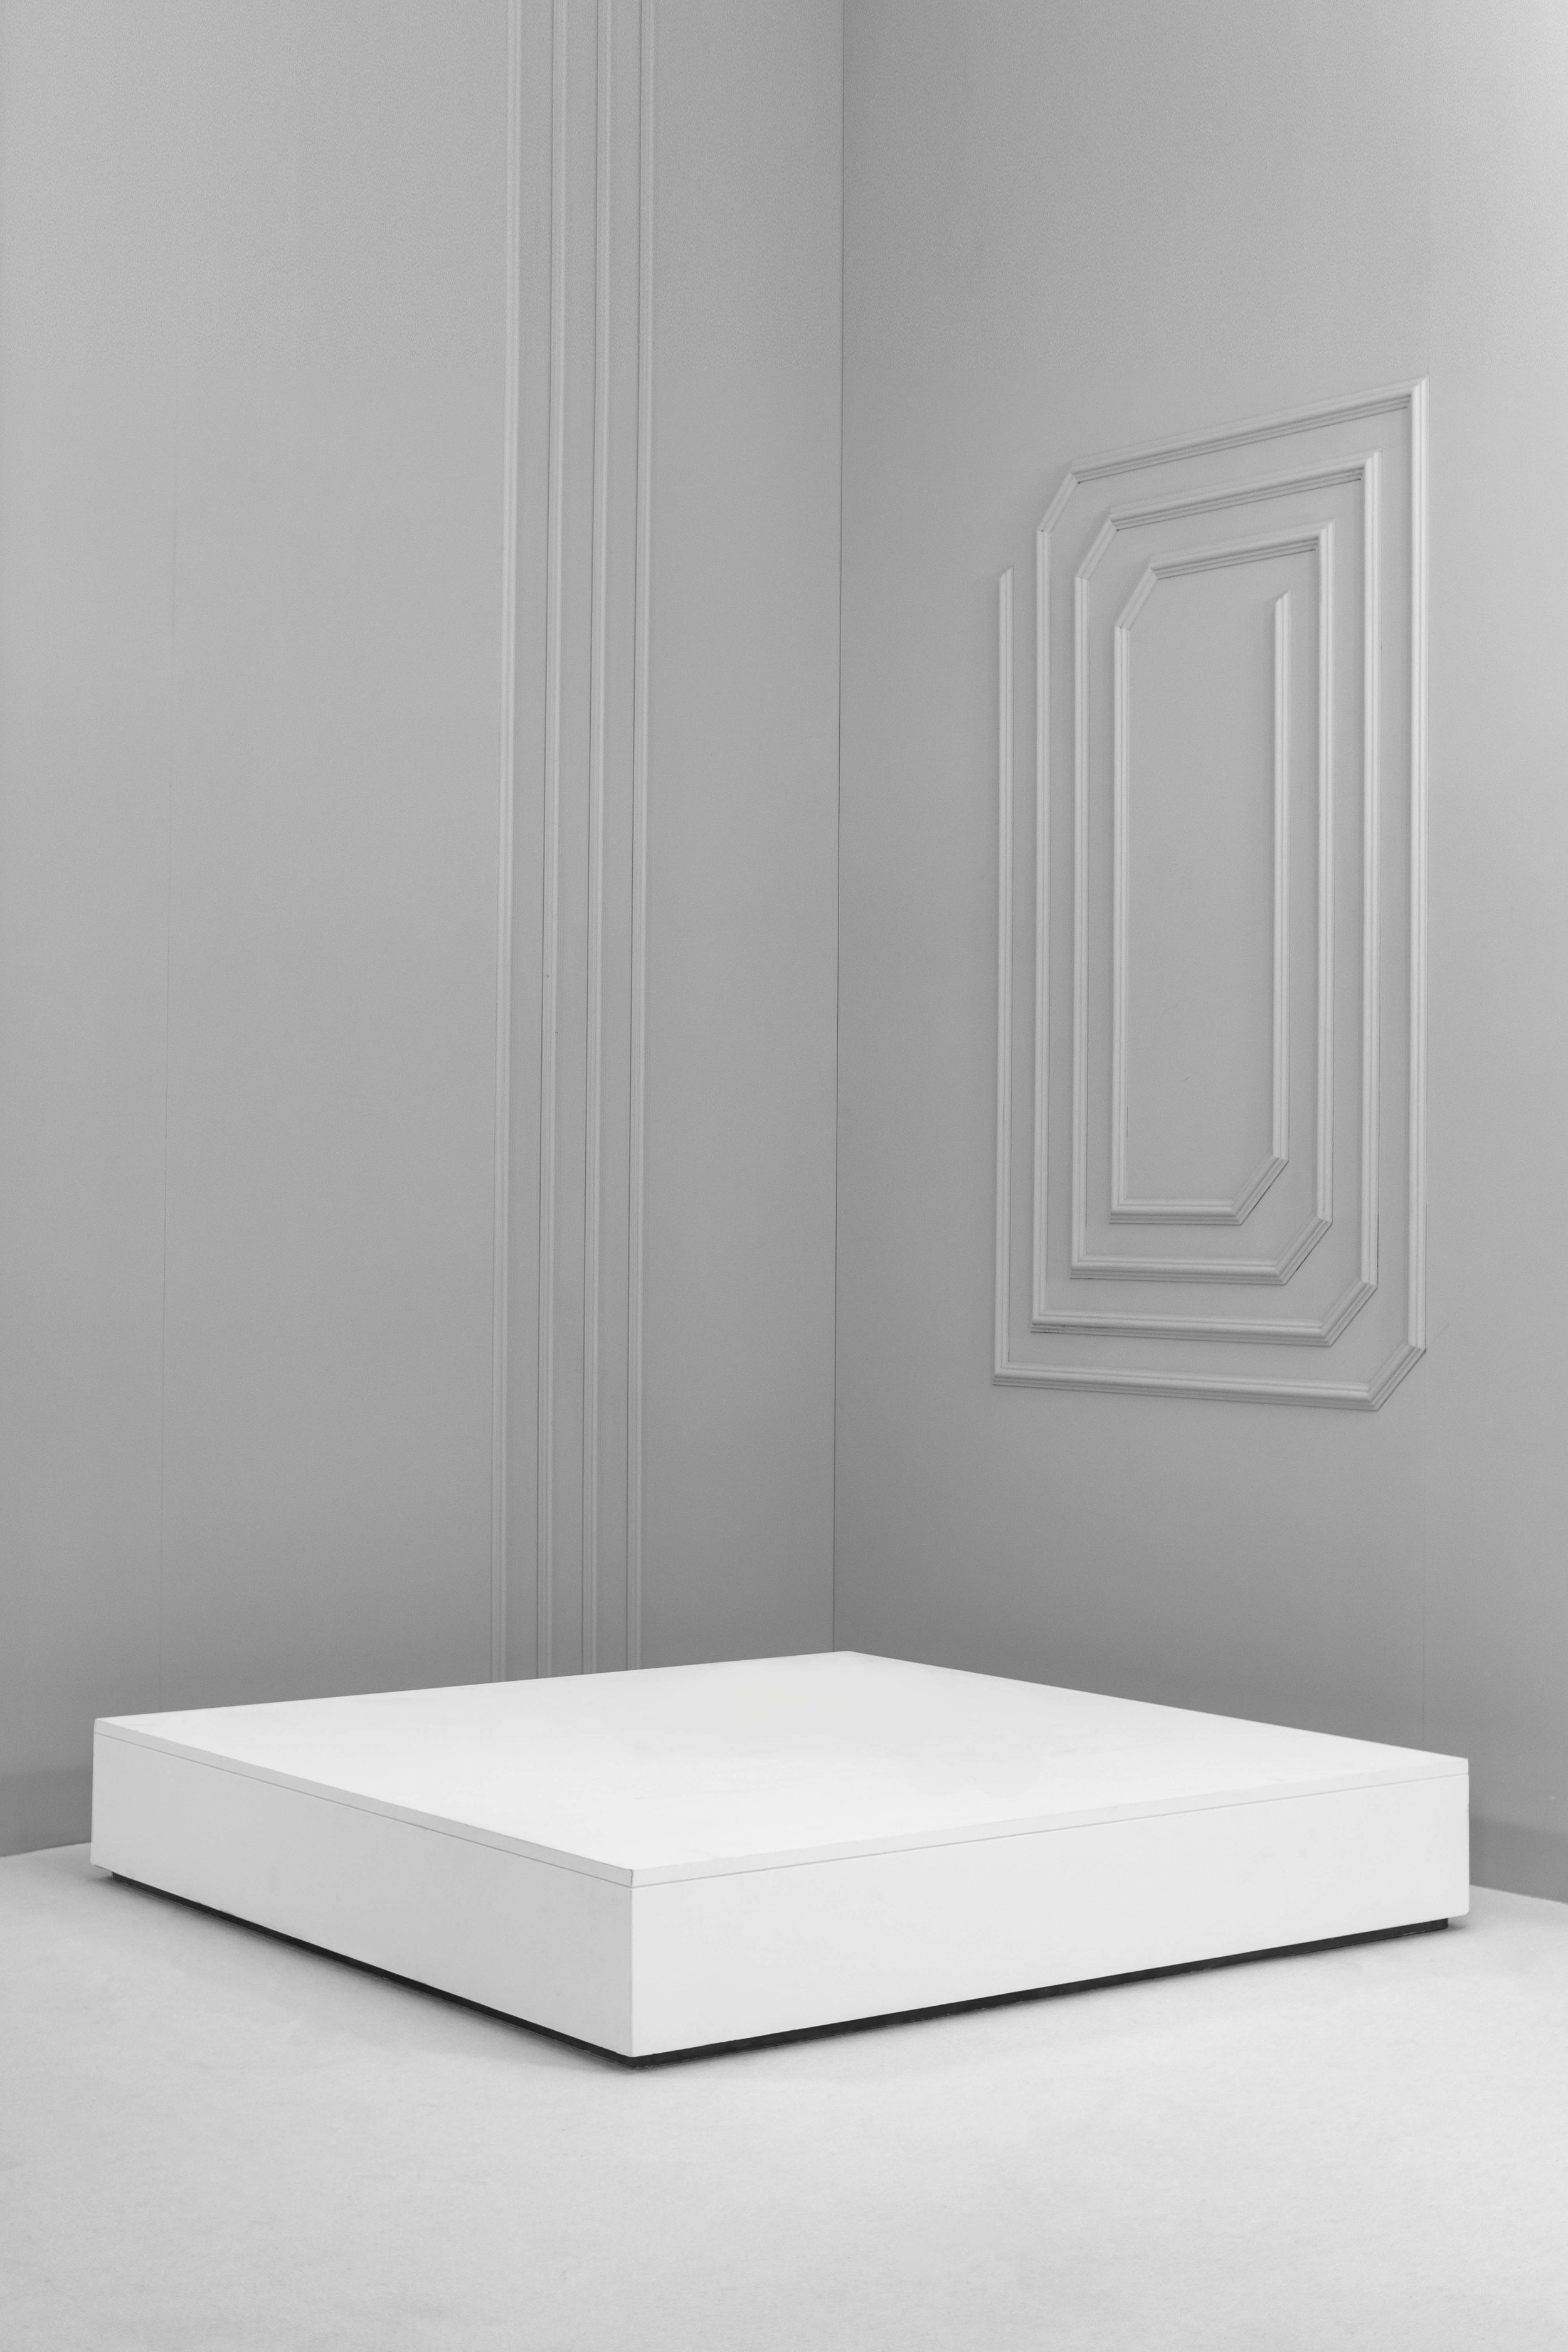 Low Square Plinths